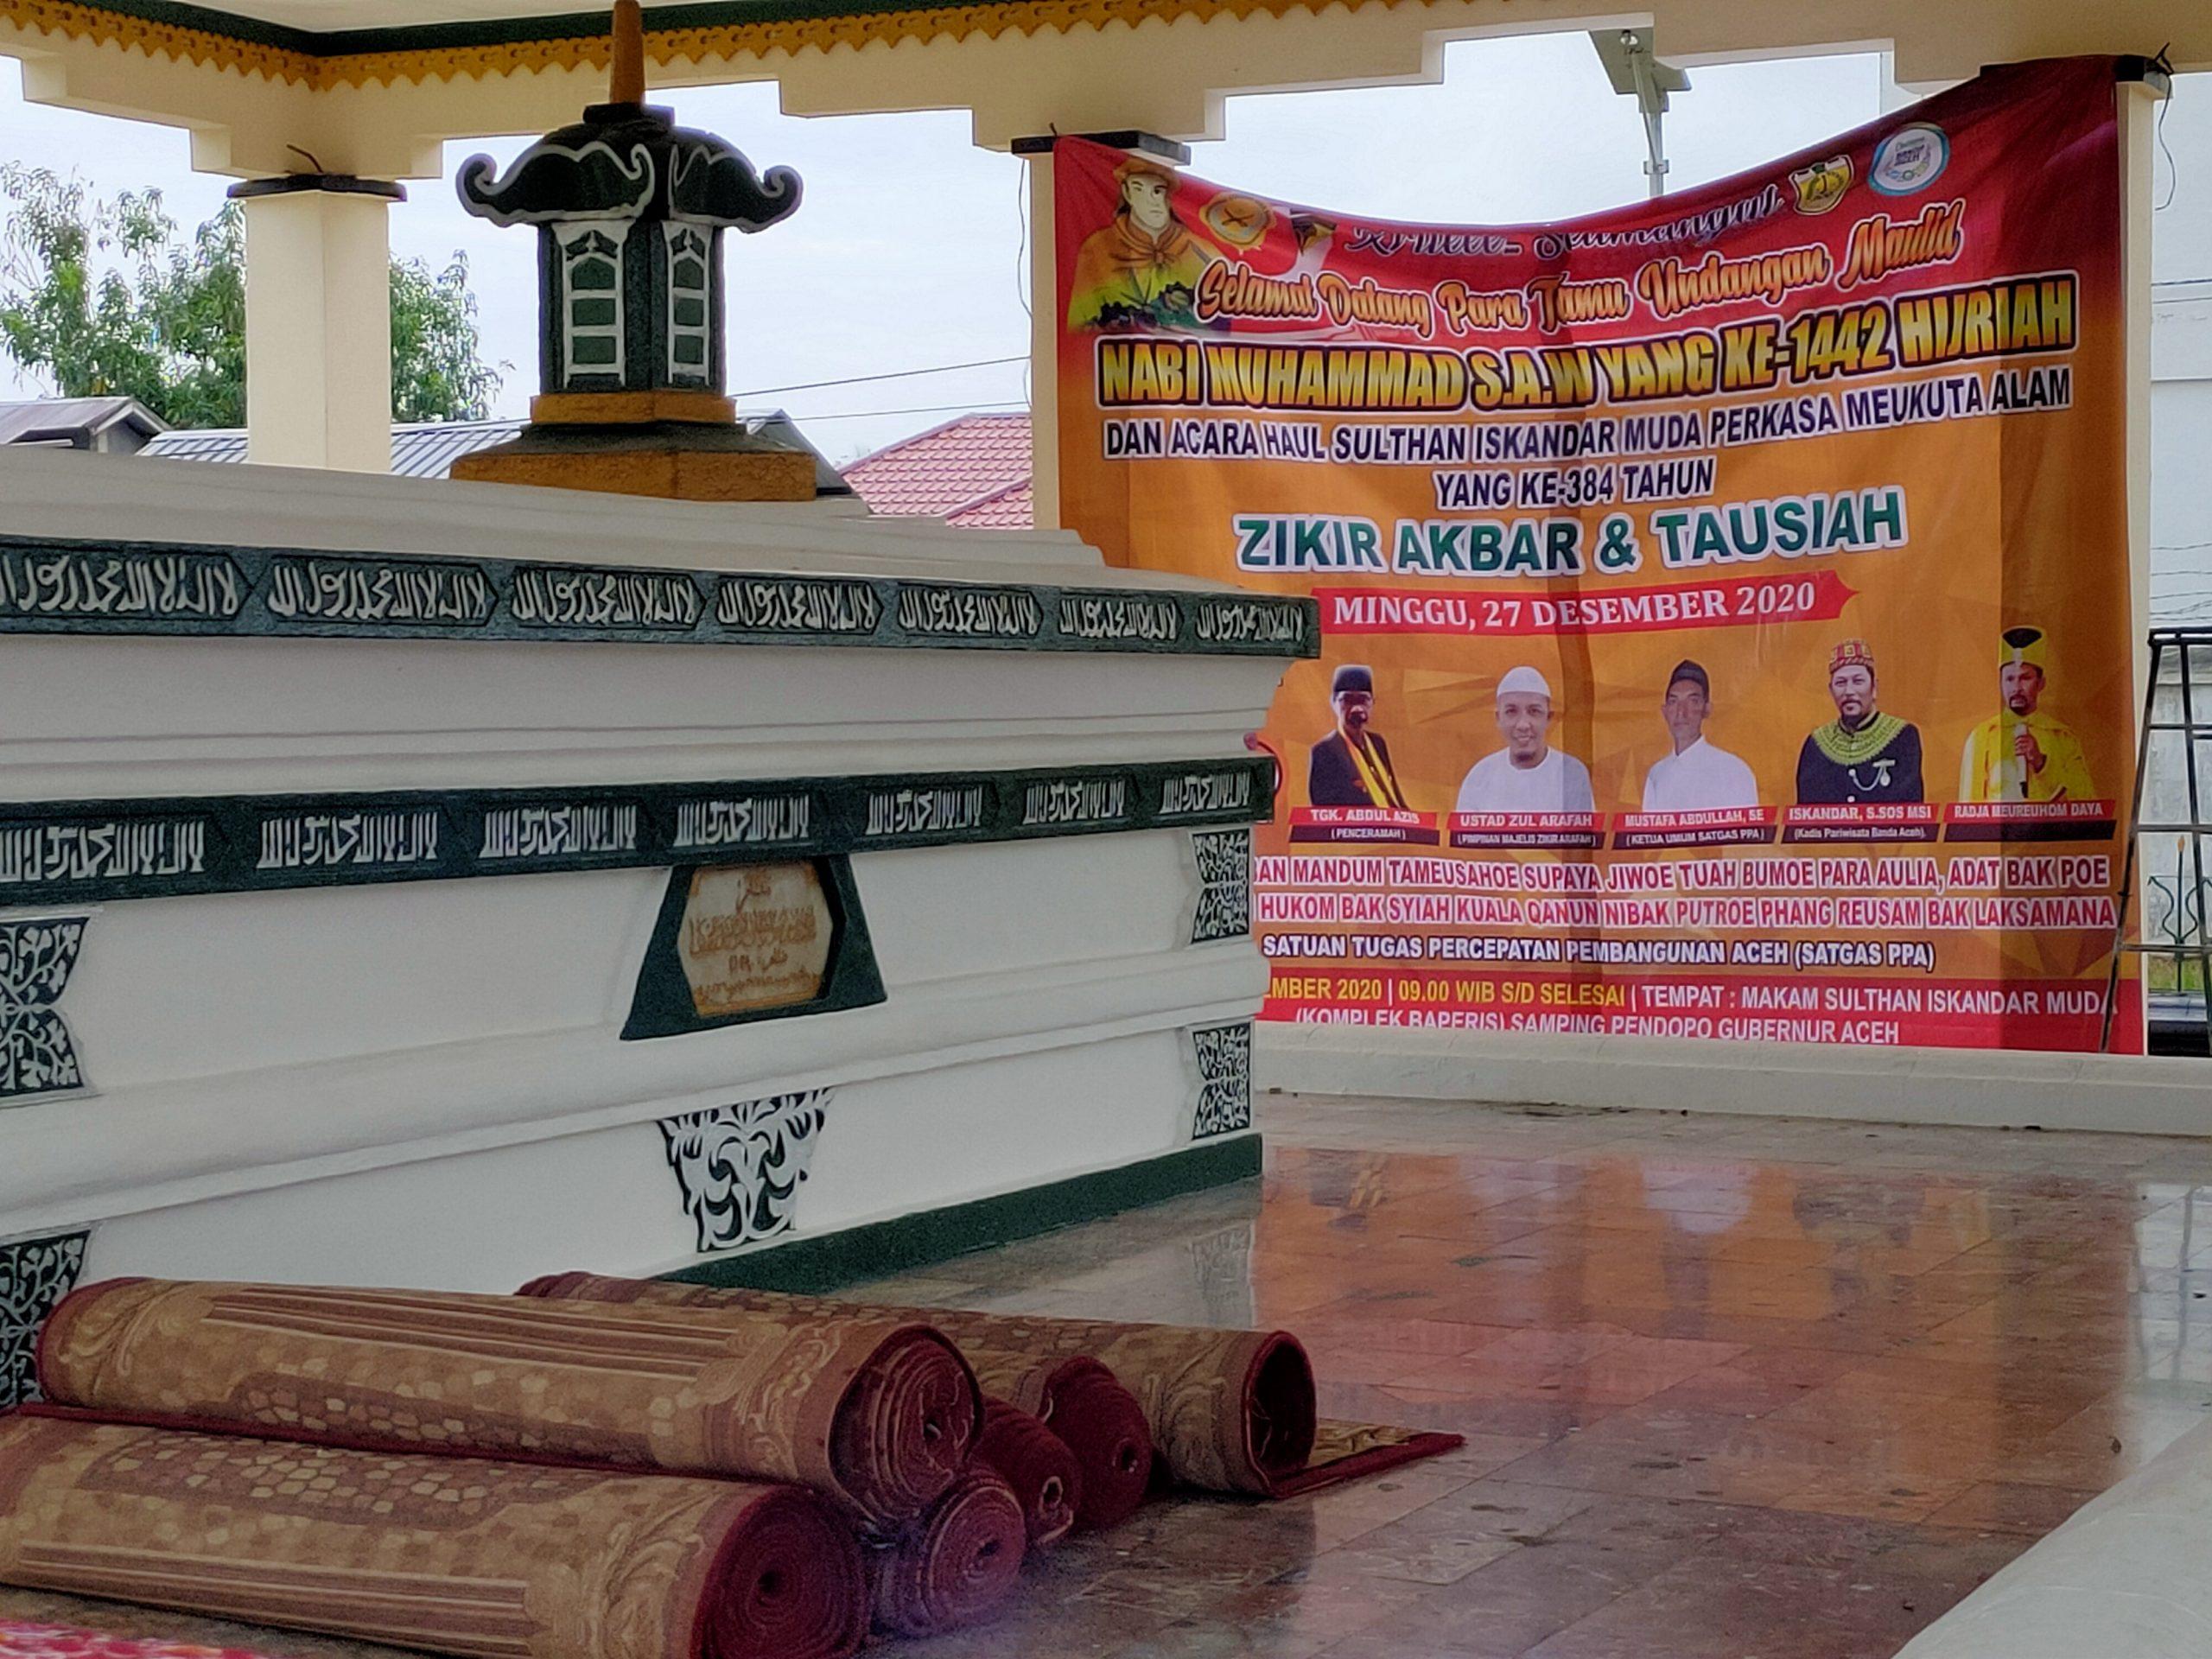 Haul Sultan Iskandar Muda Ke 384 Besok 27 Desember 2020 Aceh Monitor